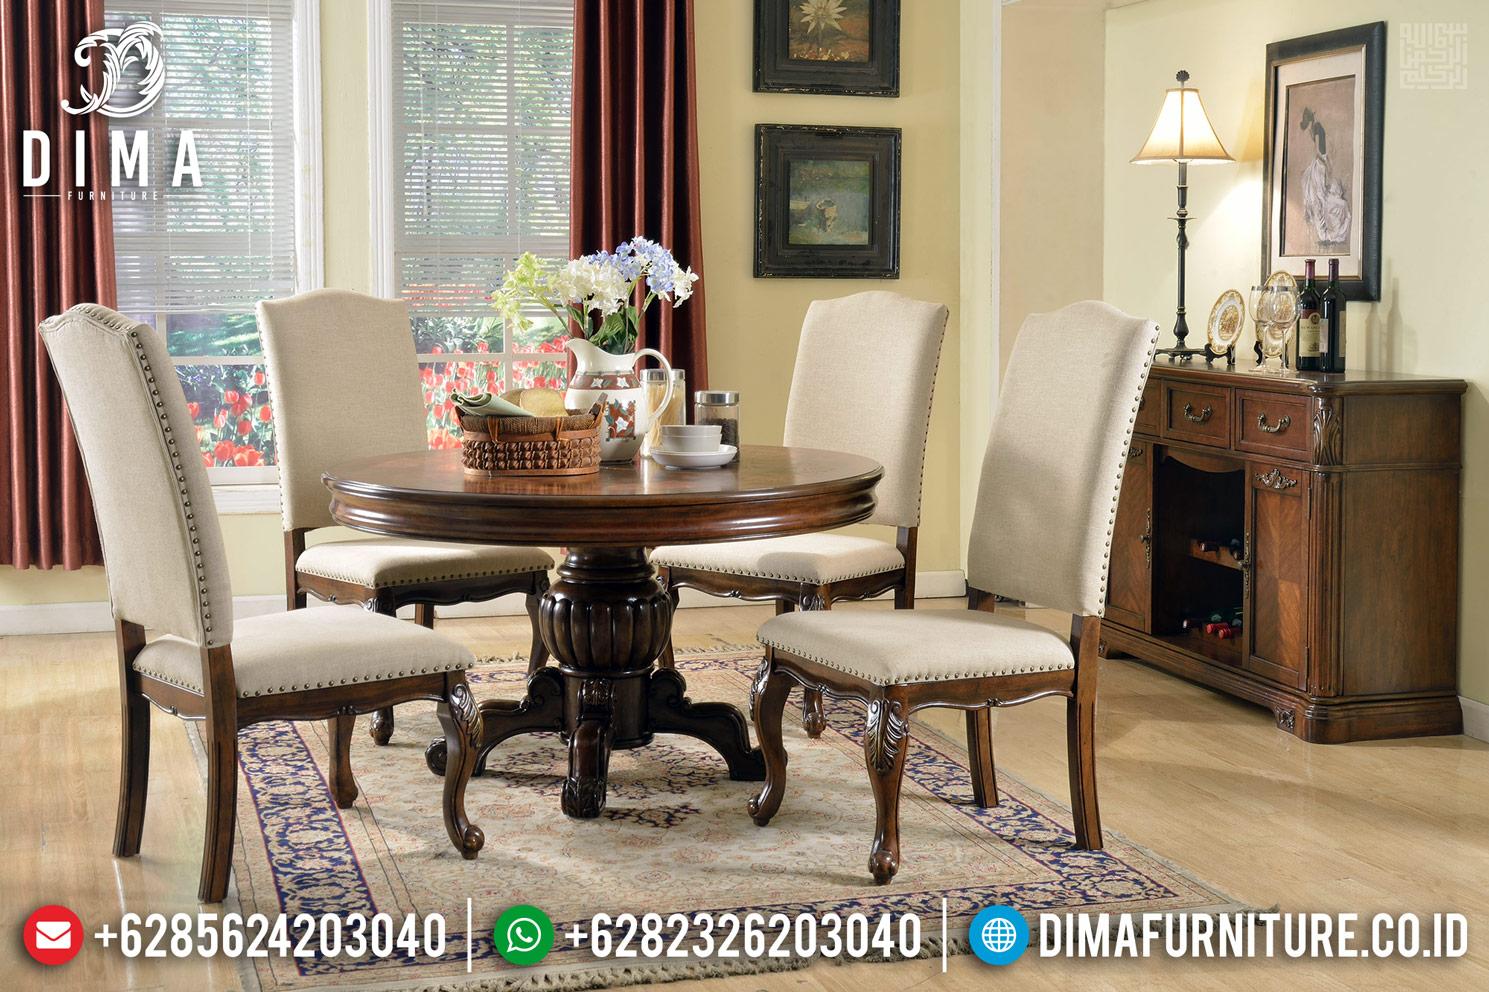 Classic Design Meja Makan Minimalis Jati Bundar Natural Luxury Gloss Color TTJ-1339